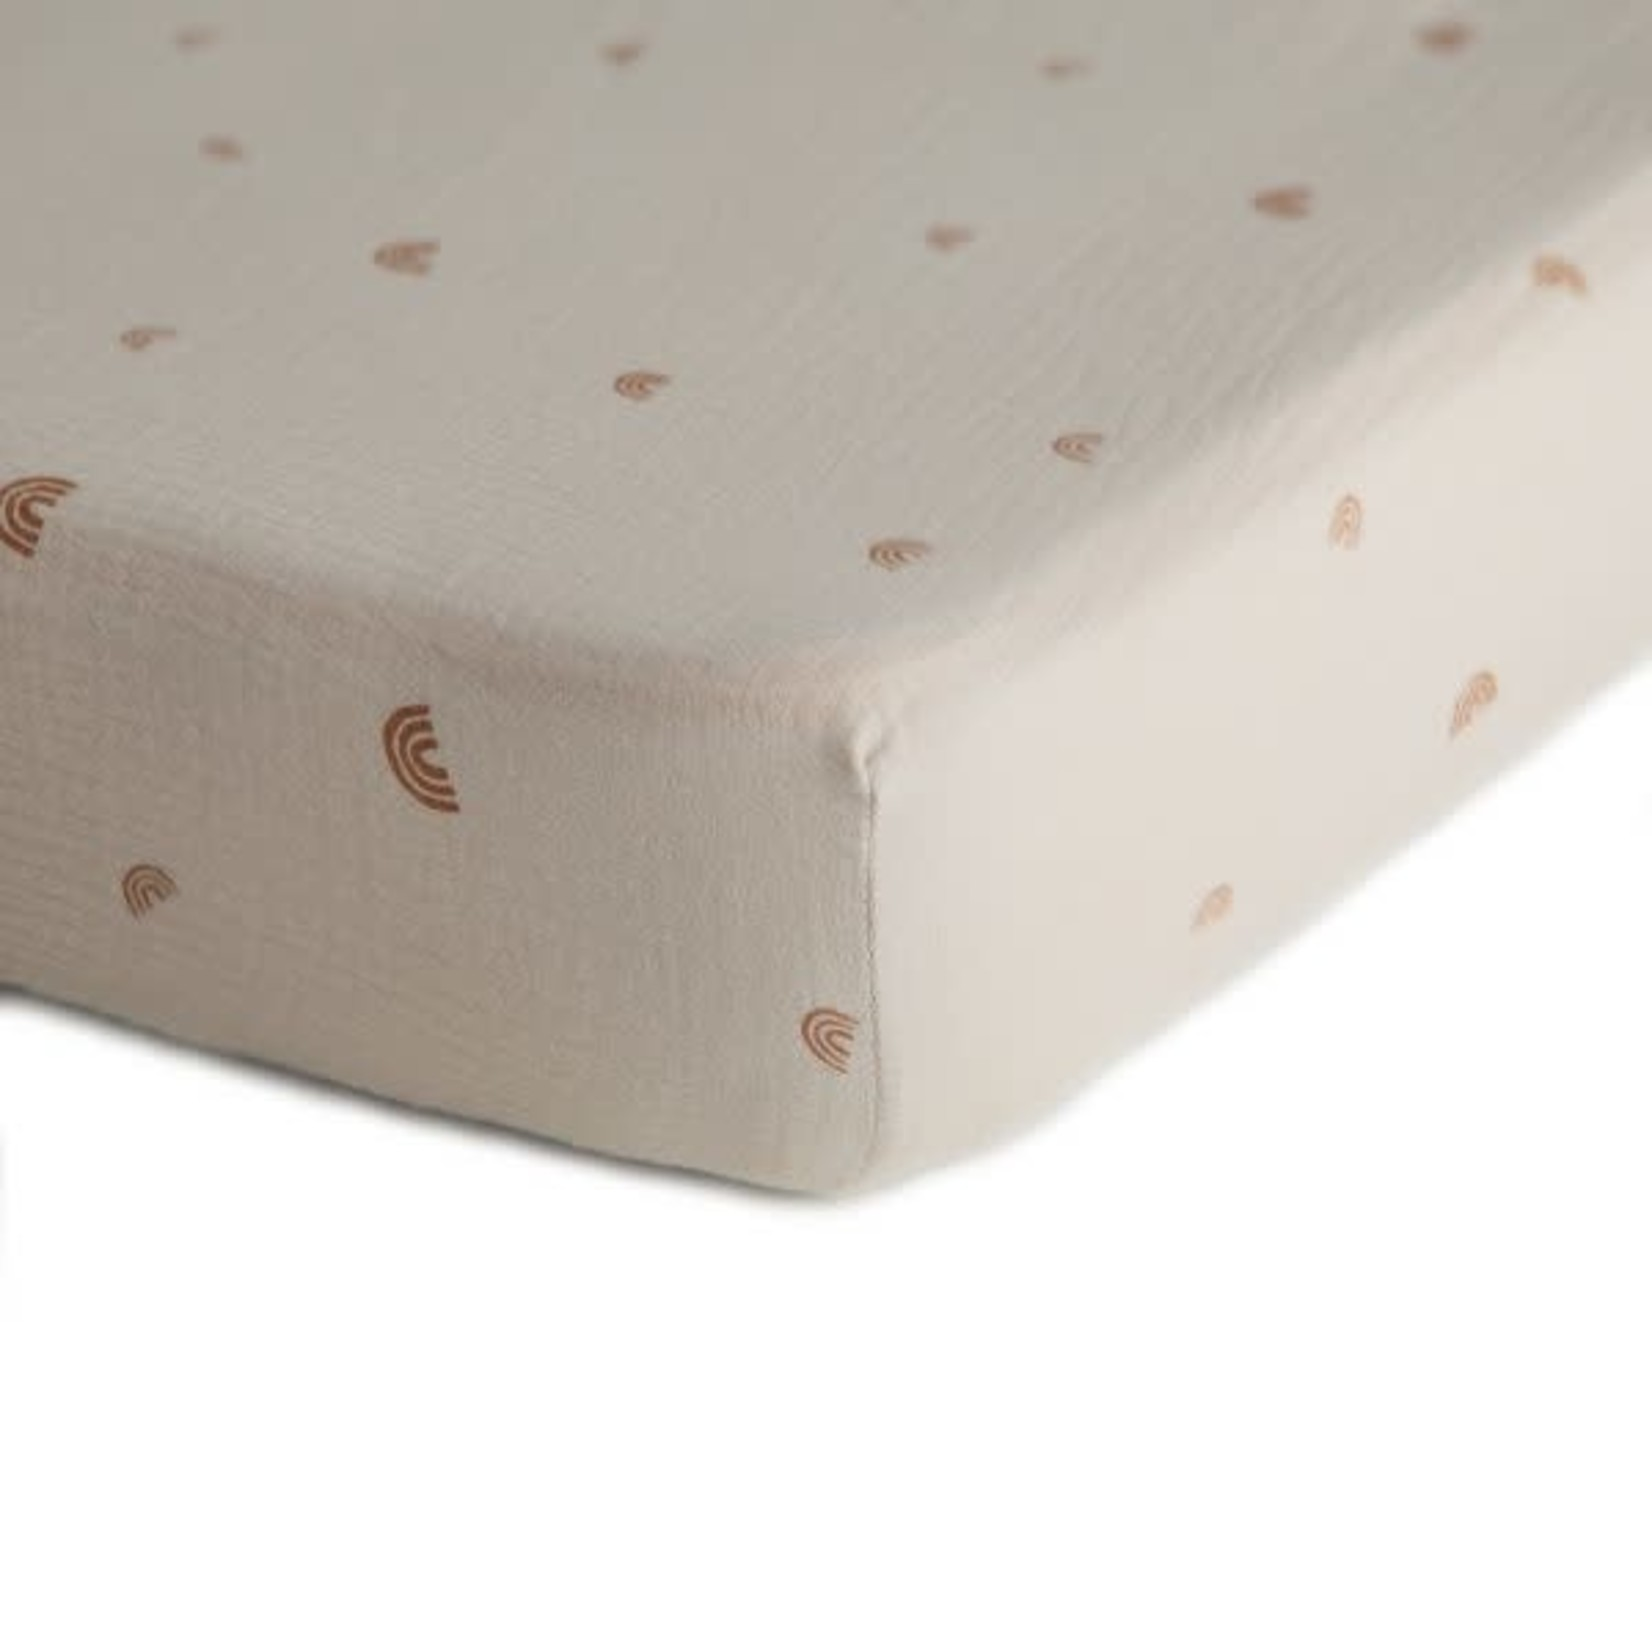 Mushie & Co Extra Soft Muslin Crib Sheet (Rainbow)